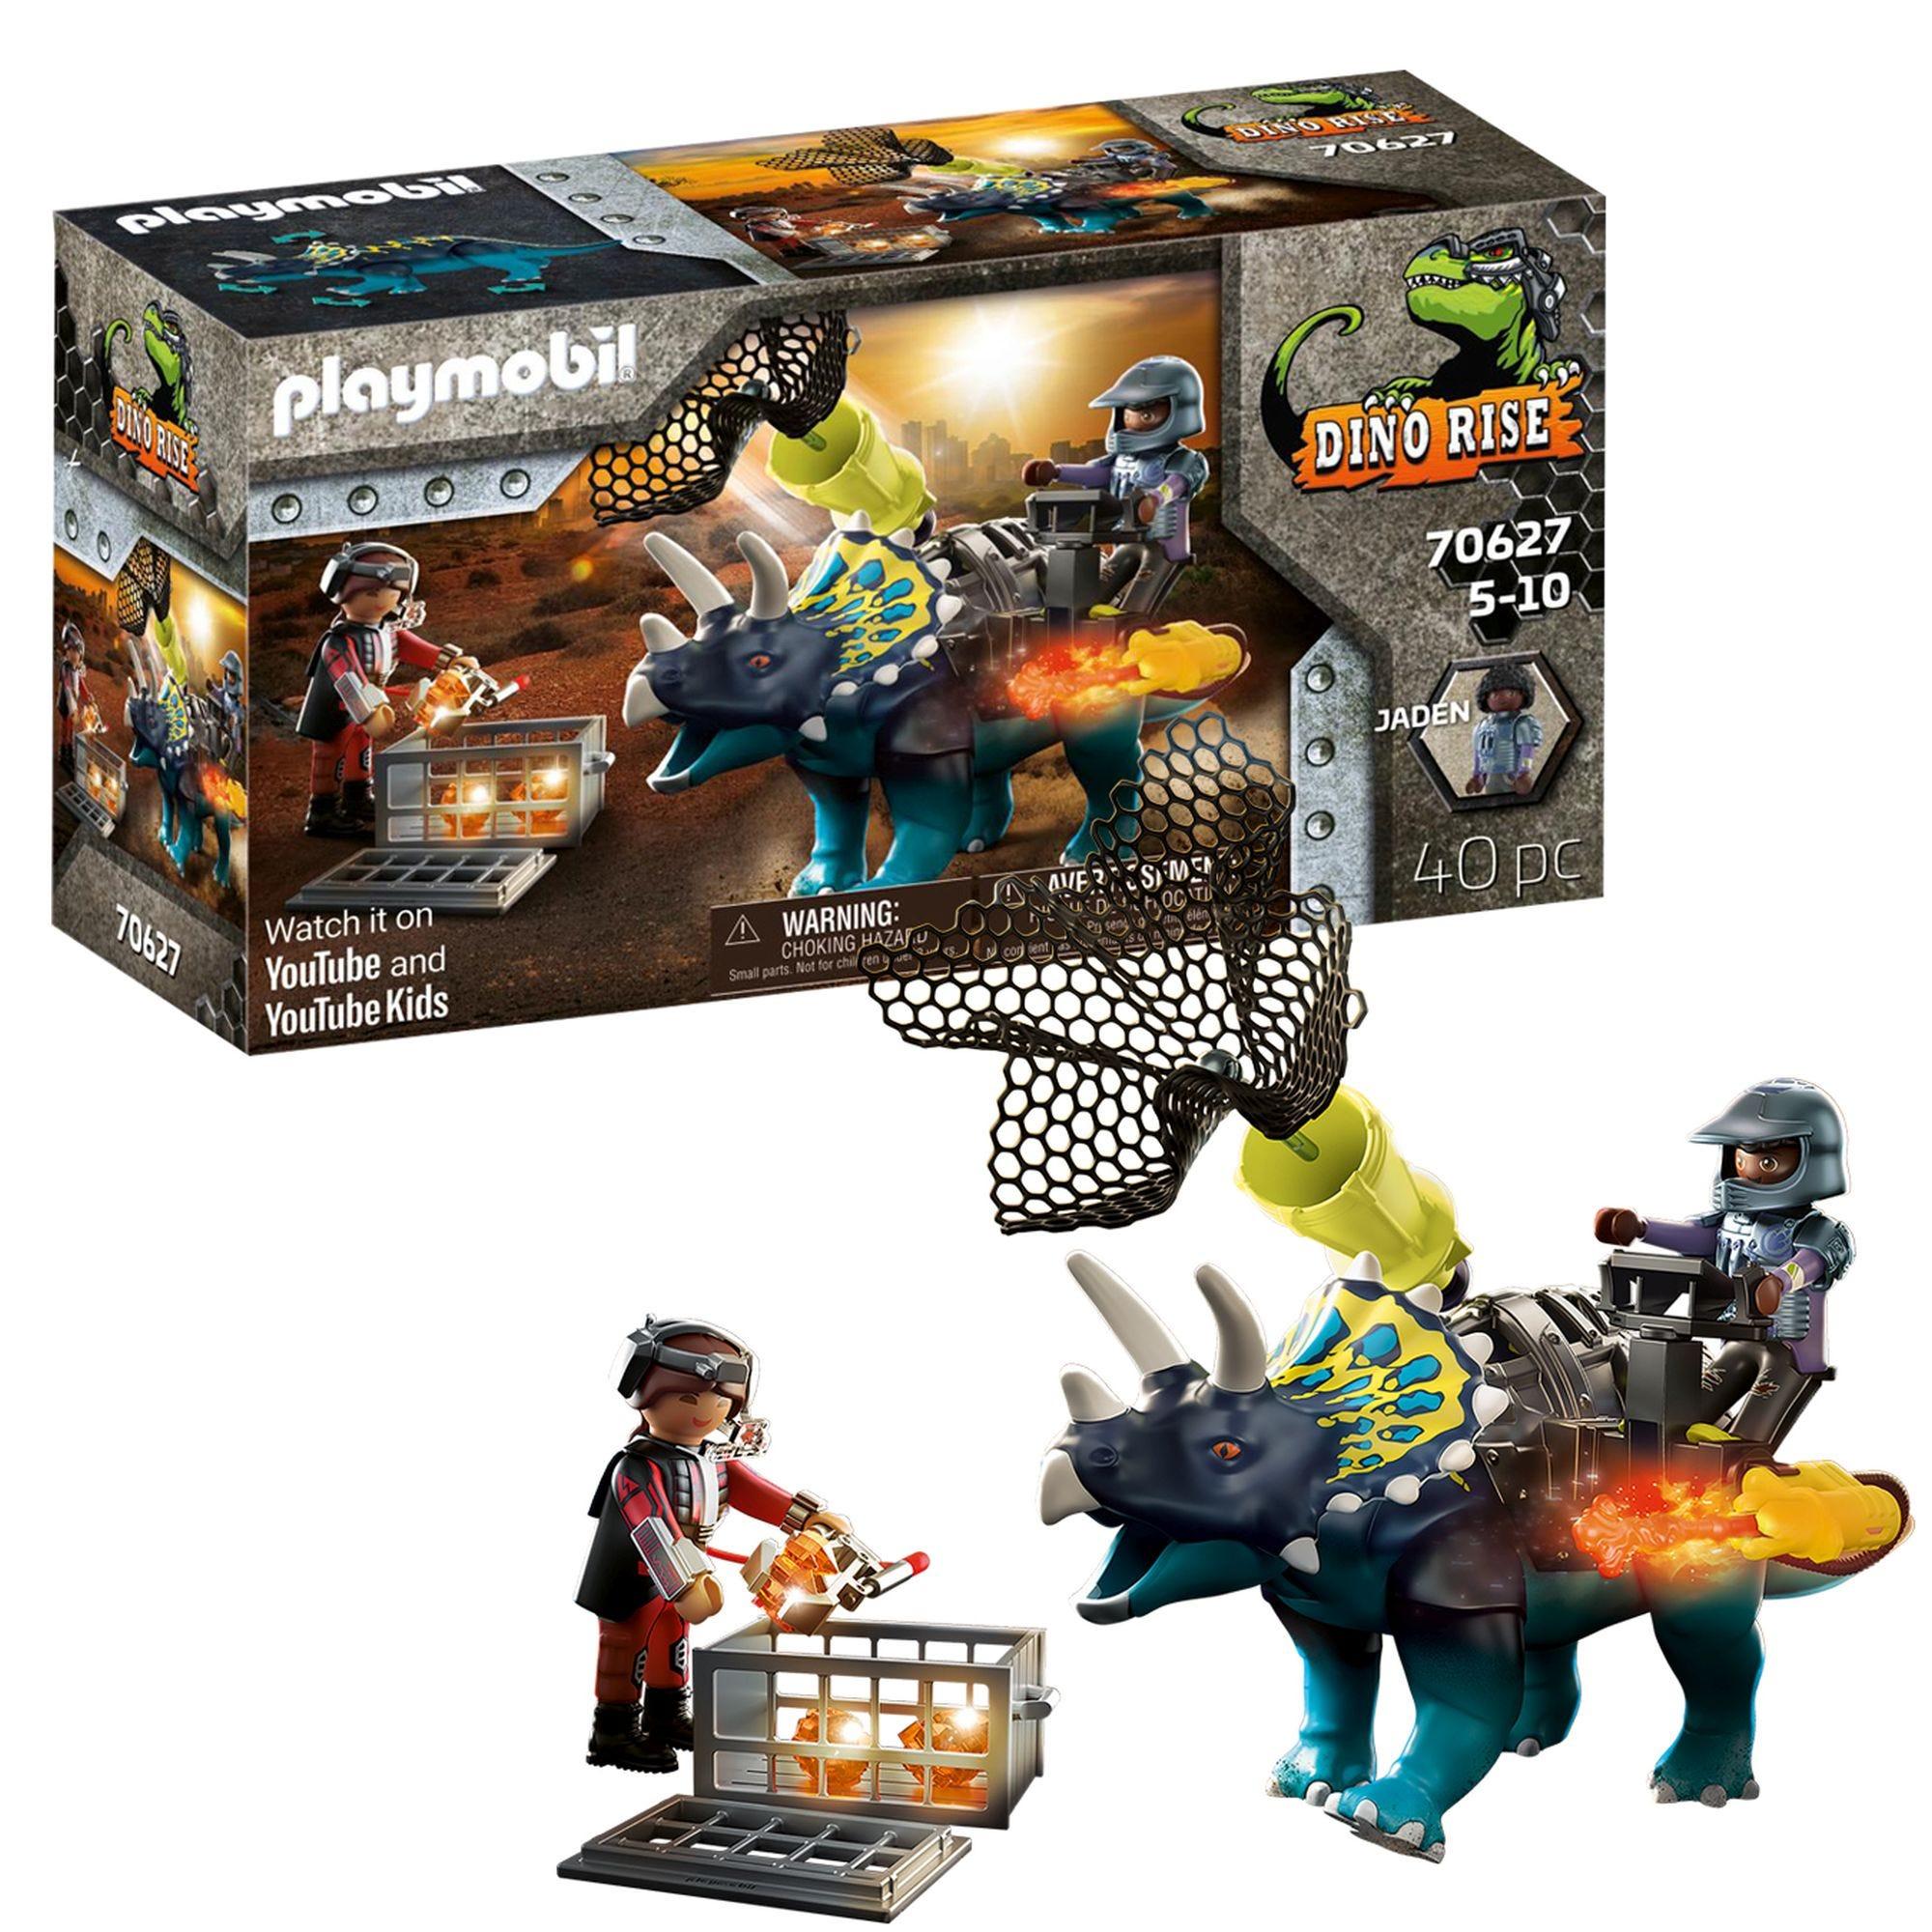 Playmobil 70627 Dino Rise Triceratops: Battle For The Legendary Stones